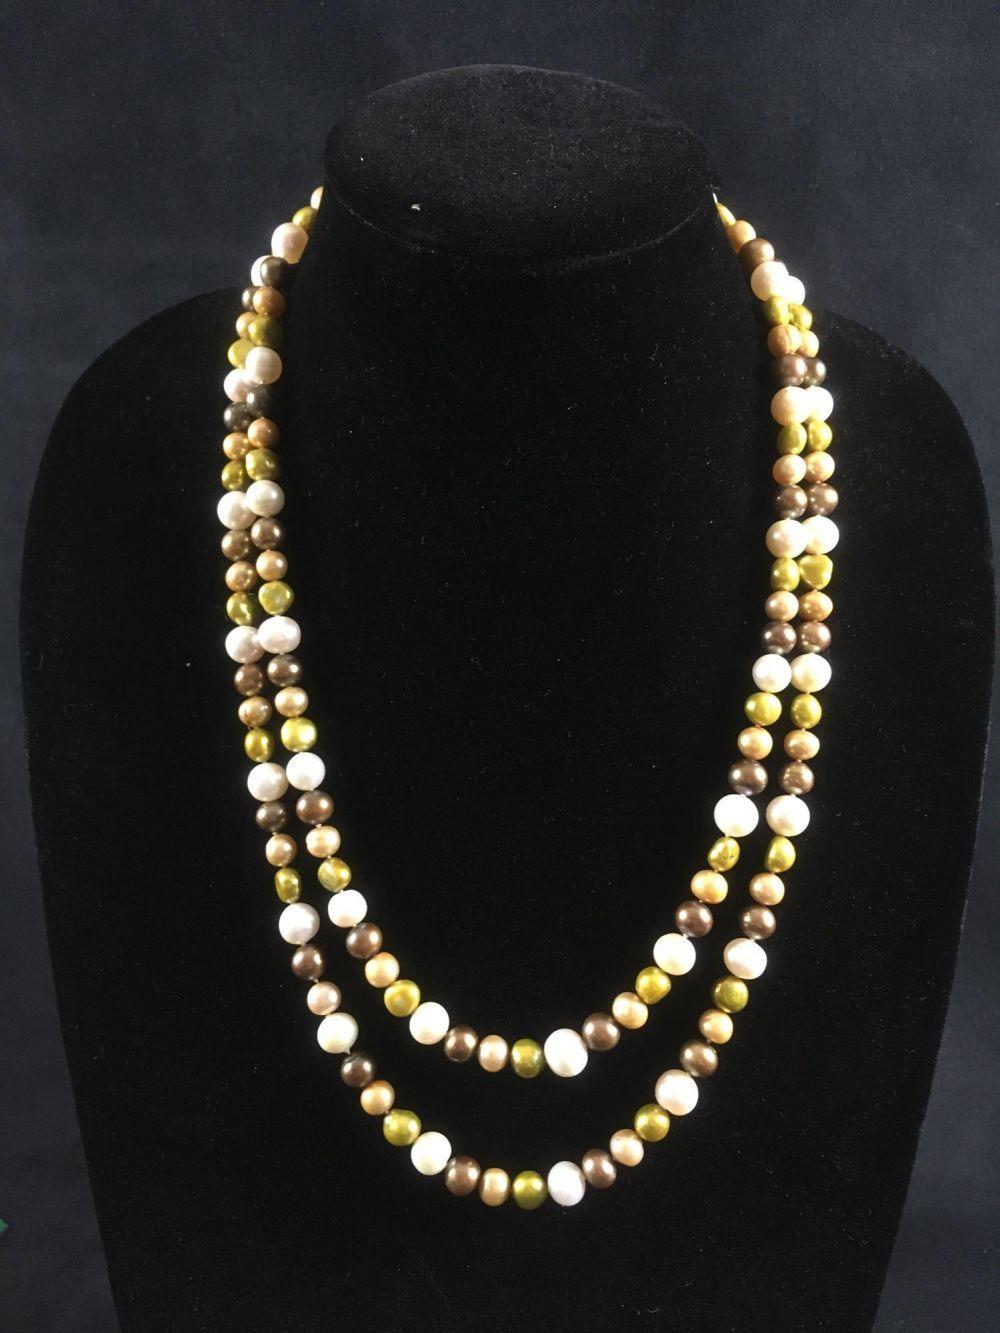 Vintage Multicolored Single Strand Pearl Necklace